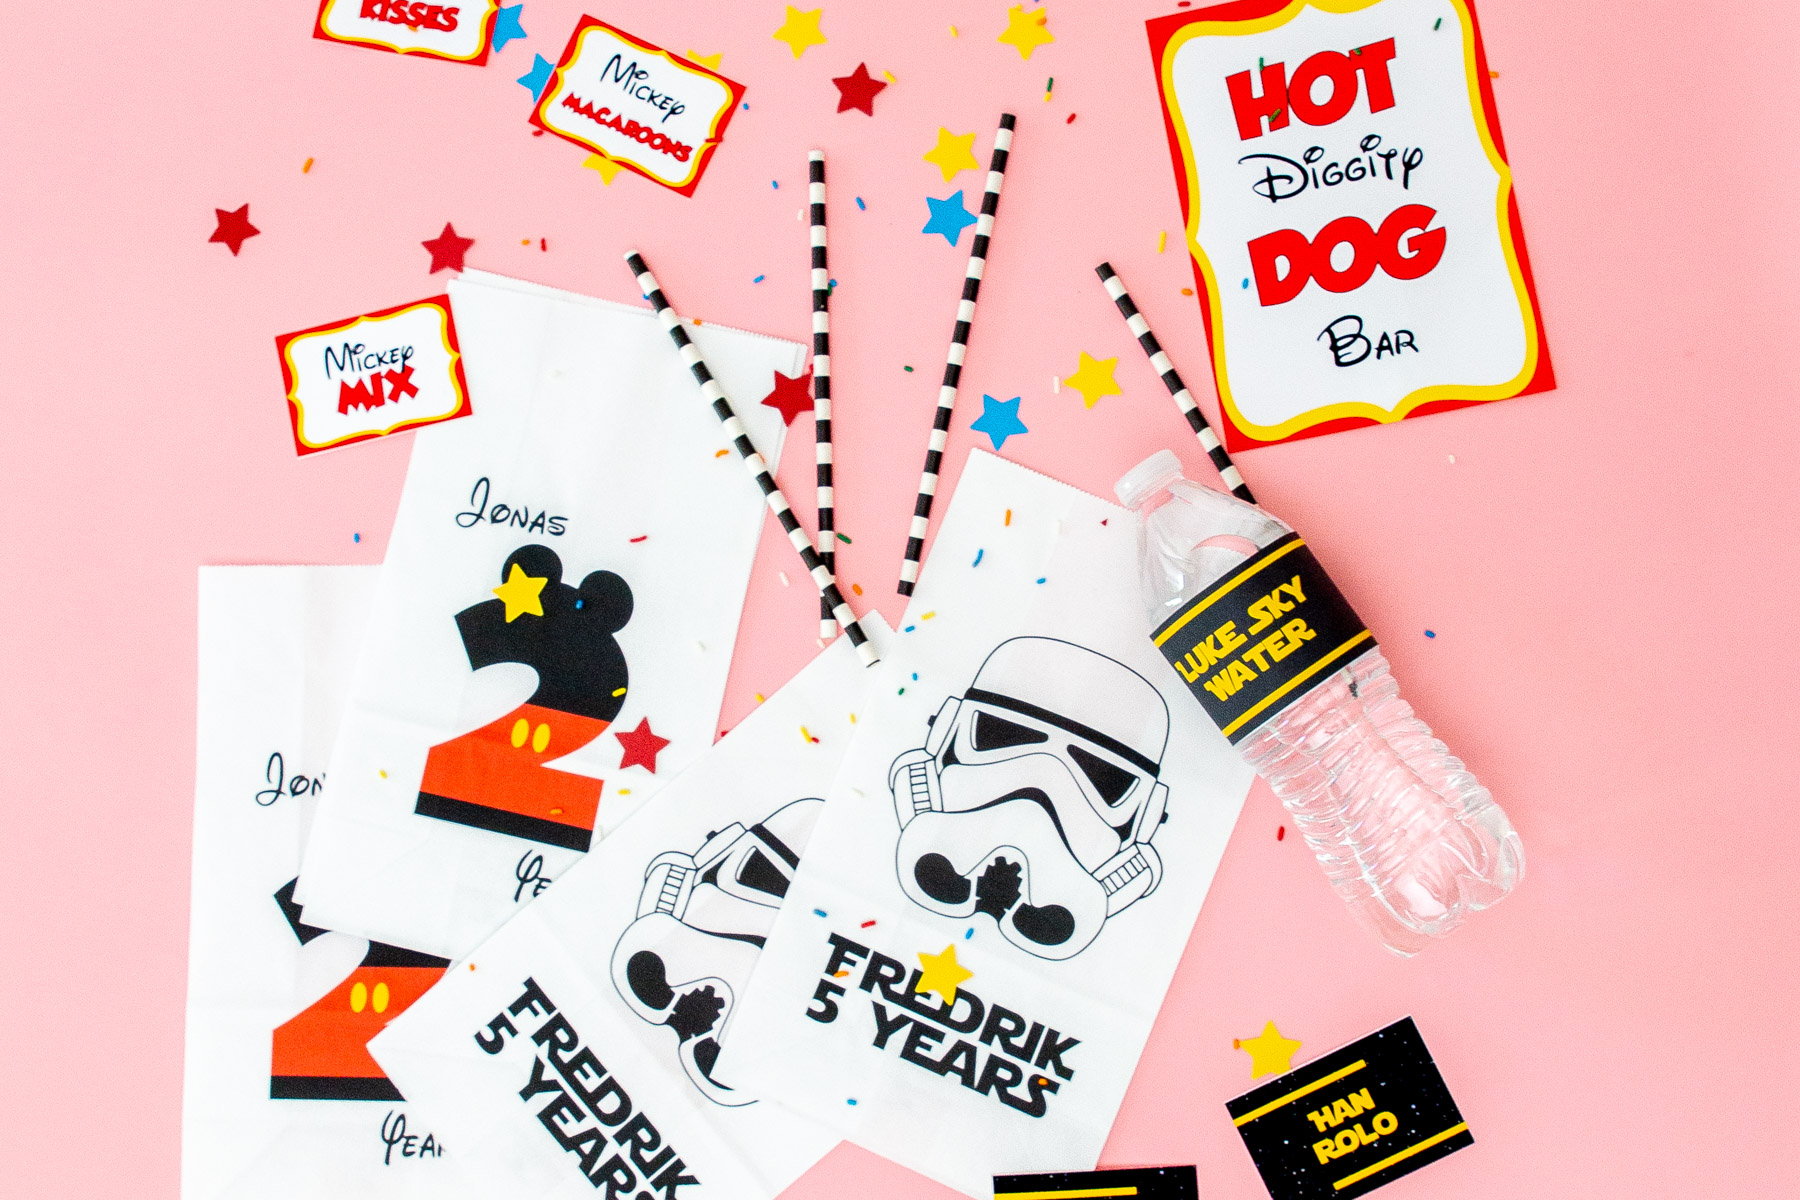 Godteposer og etiketter i Mikke Mus og Star Wars-tema.